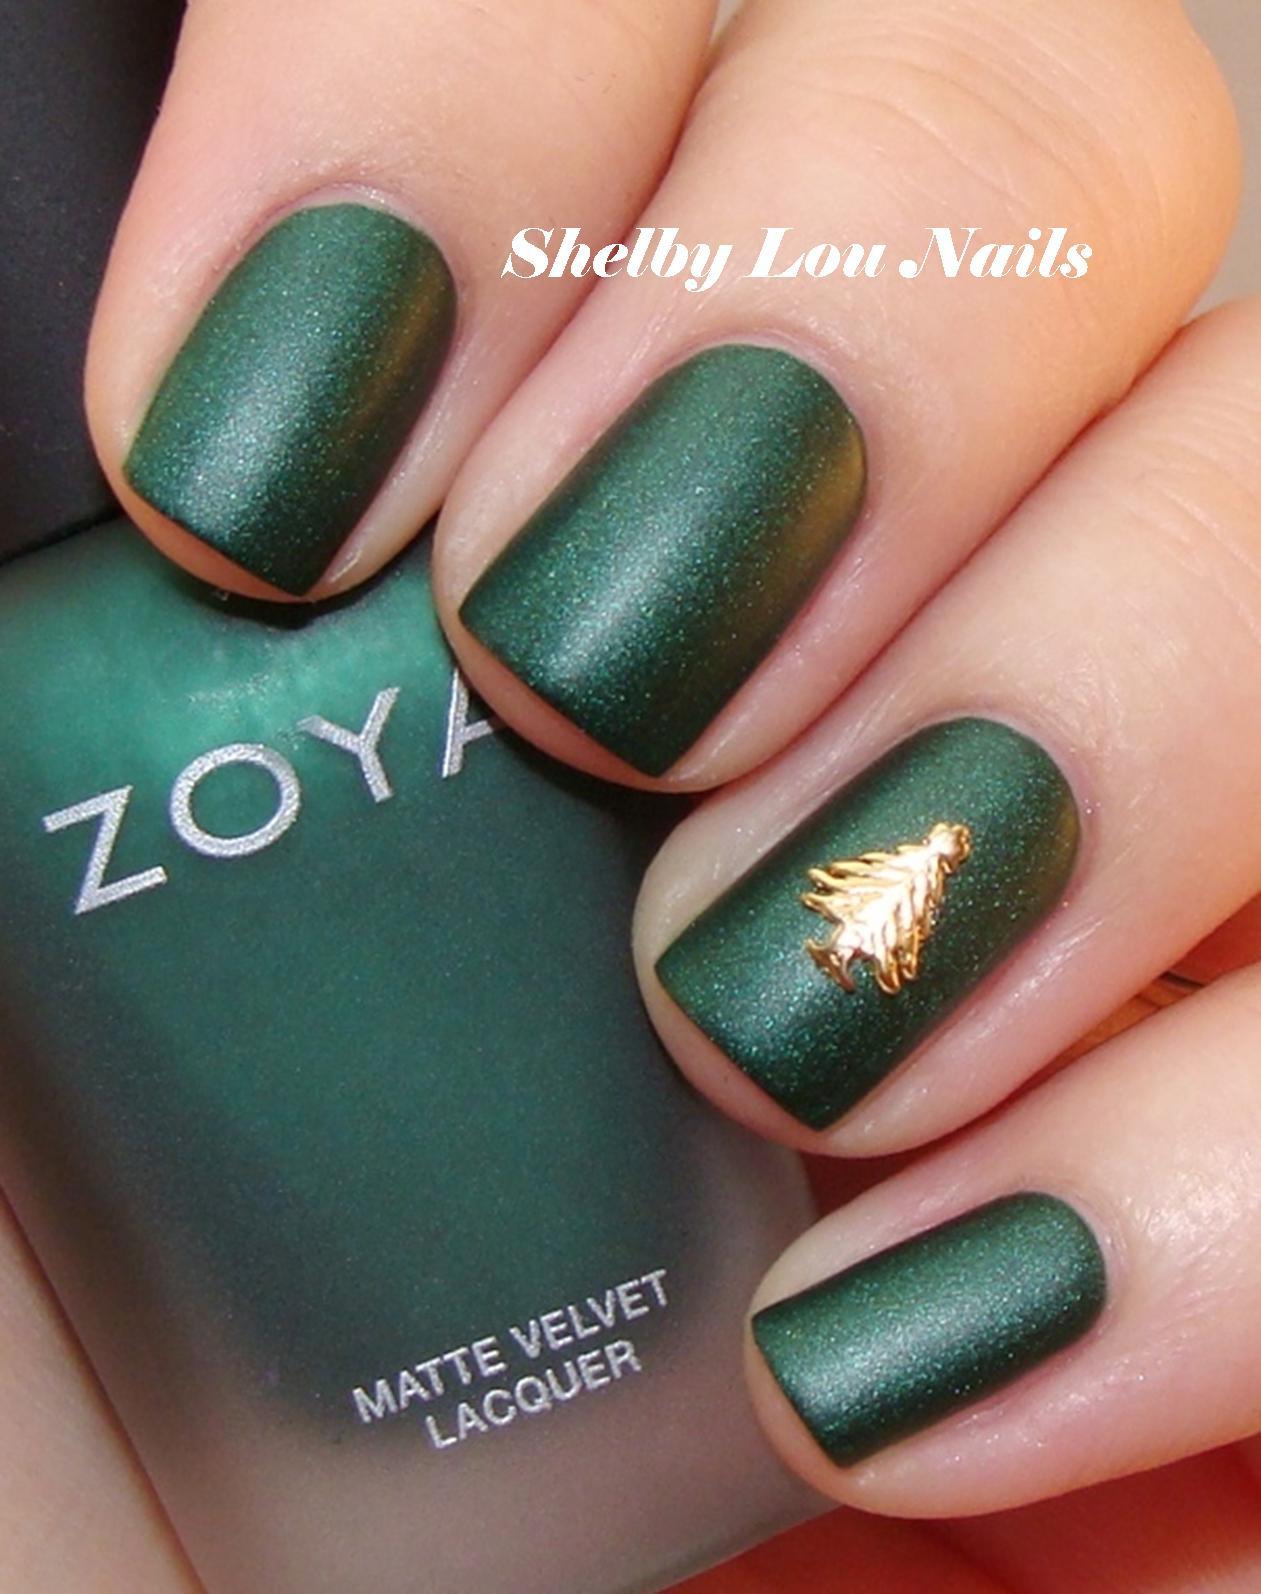 Shelby Lou Nails: Zoya Veruschka with Hex Nail Jewelry